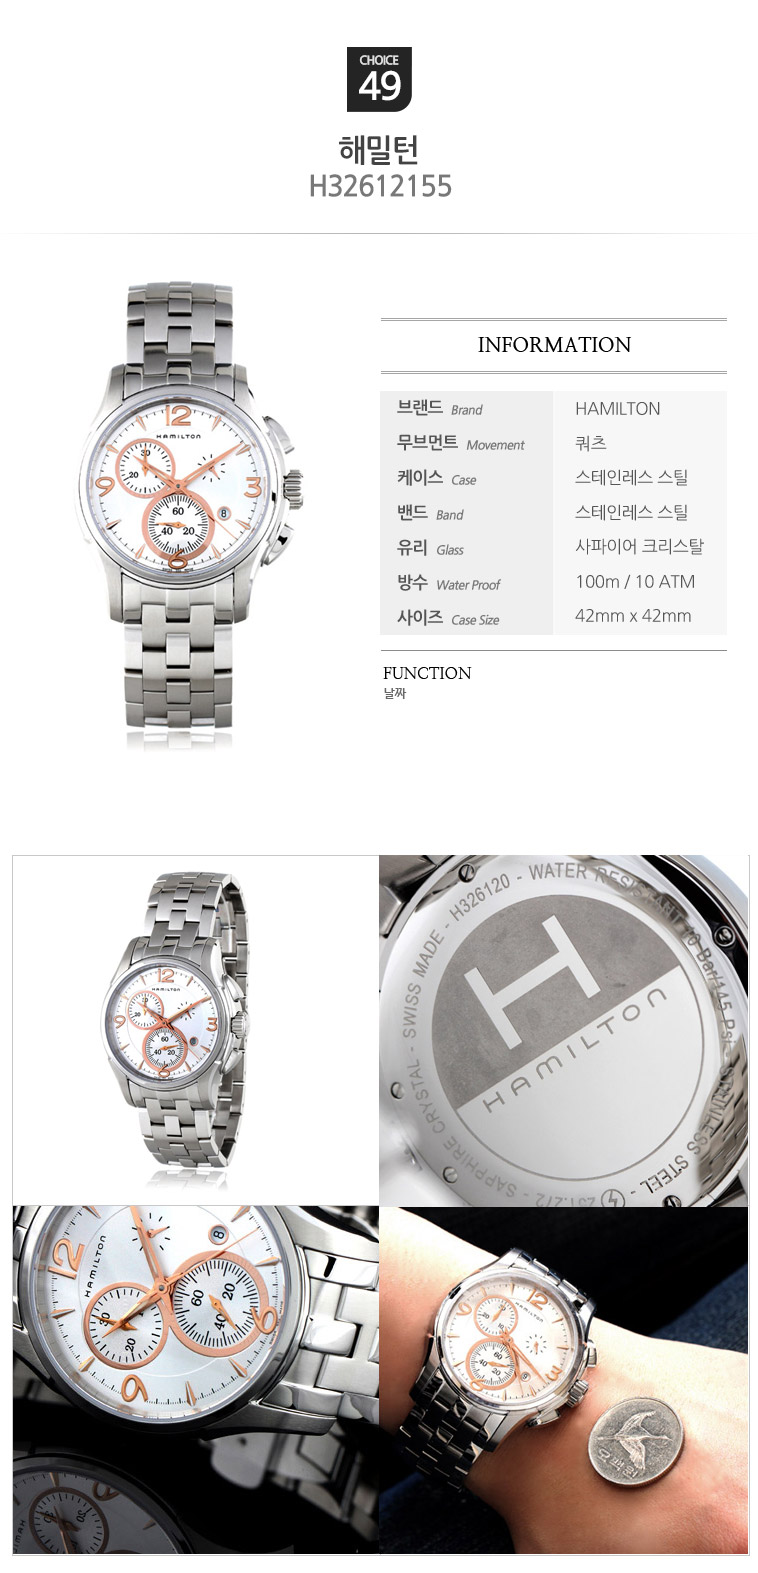 d82c58d1de2 ... 무료배송] 티쏘/해밀턴 인기시계 - 상세정보 ...